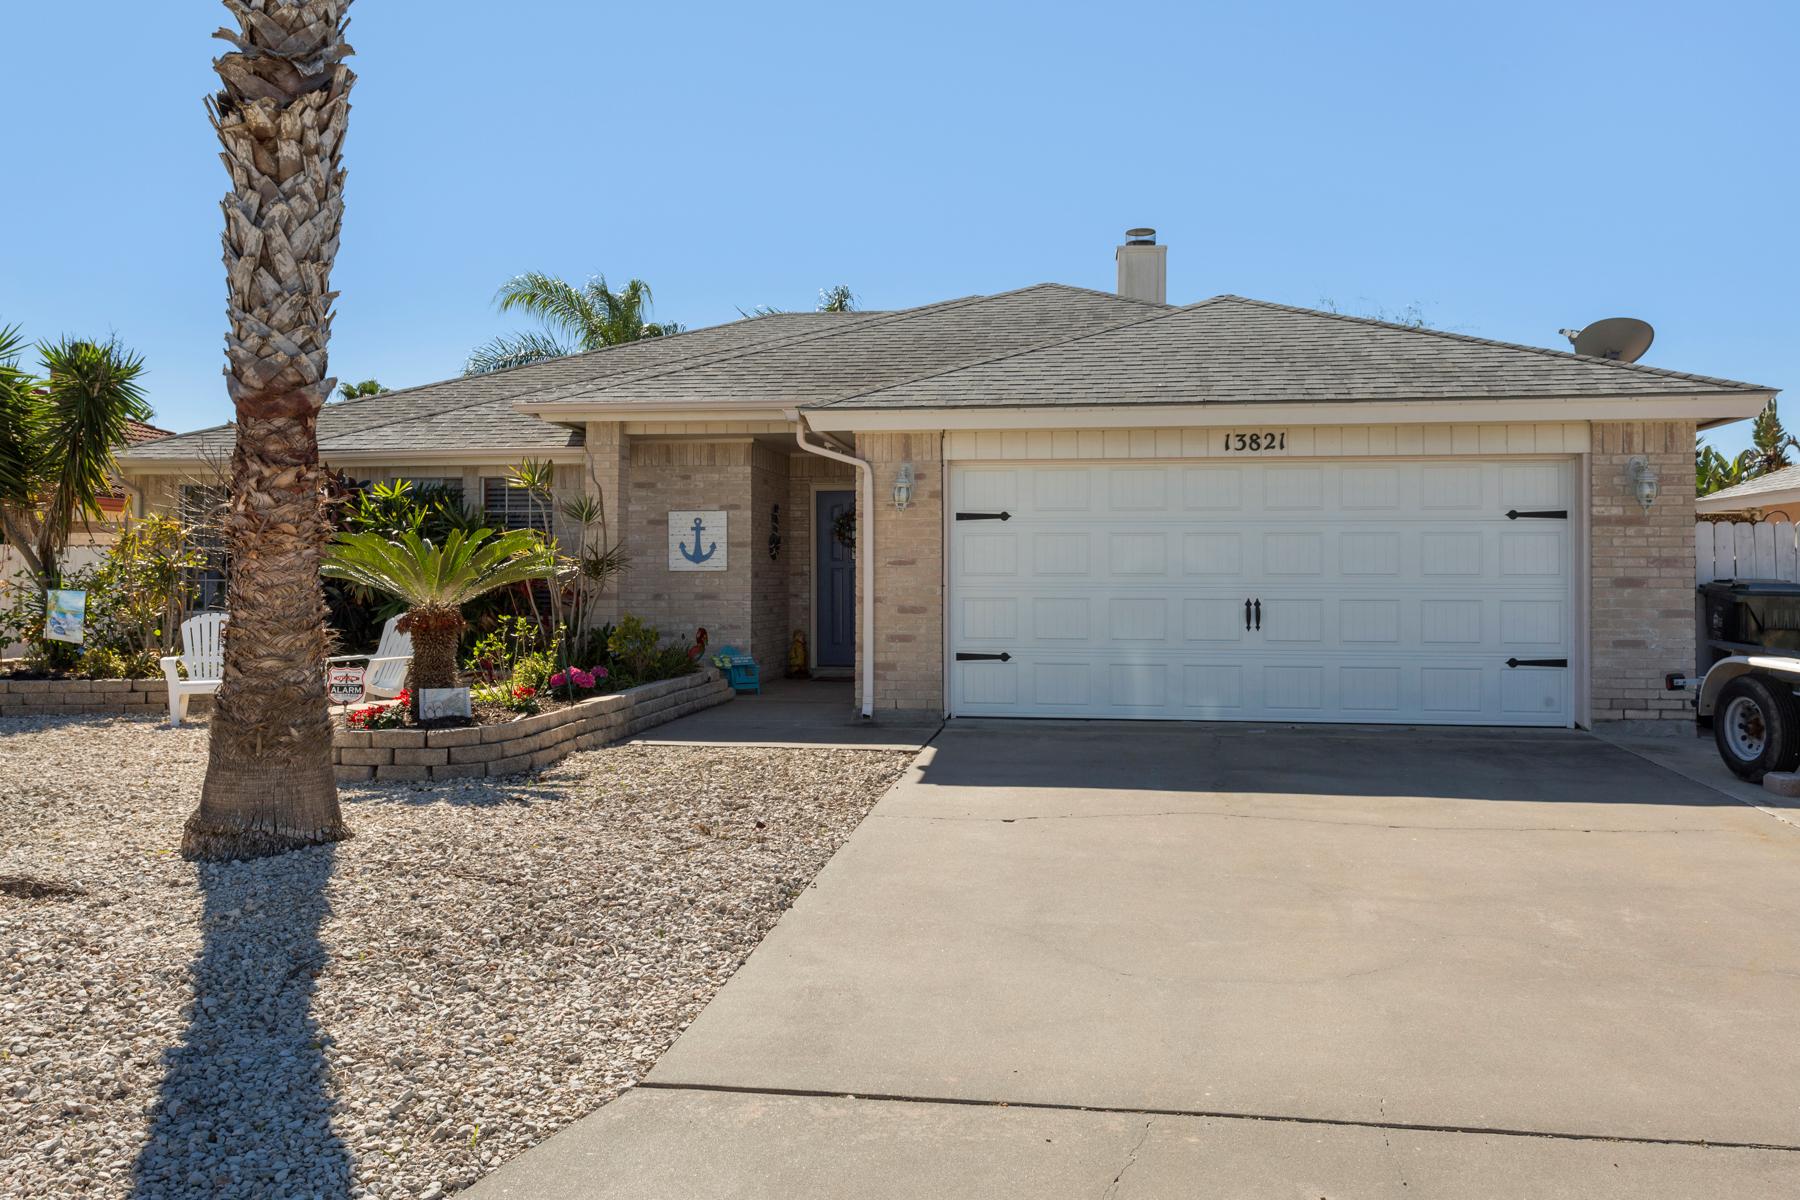 Casa Unifamiliar por un Venta en Beautiful Home in Corpus Christi 13821 Gunwale Dr Corpus Christi, Texas 78418 Estados Unidos